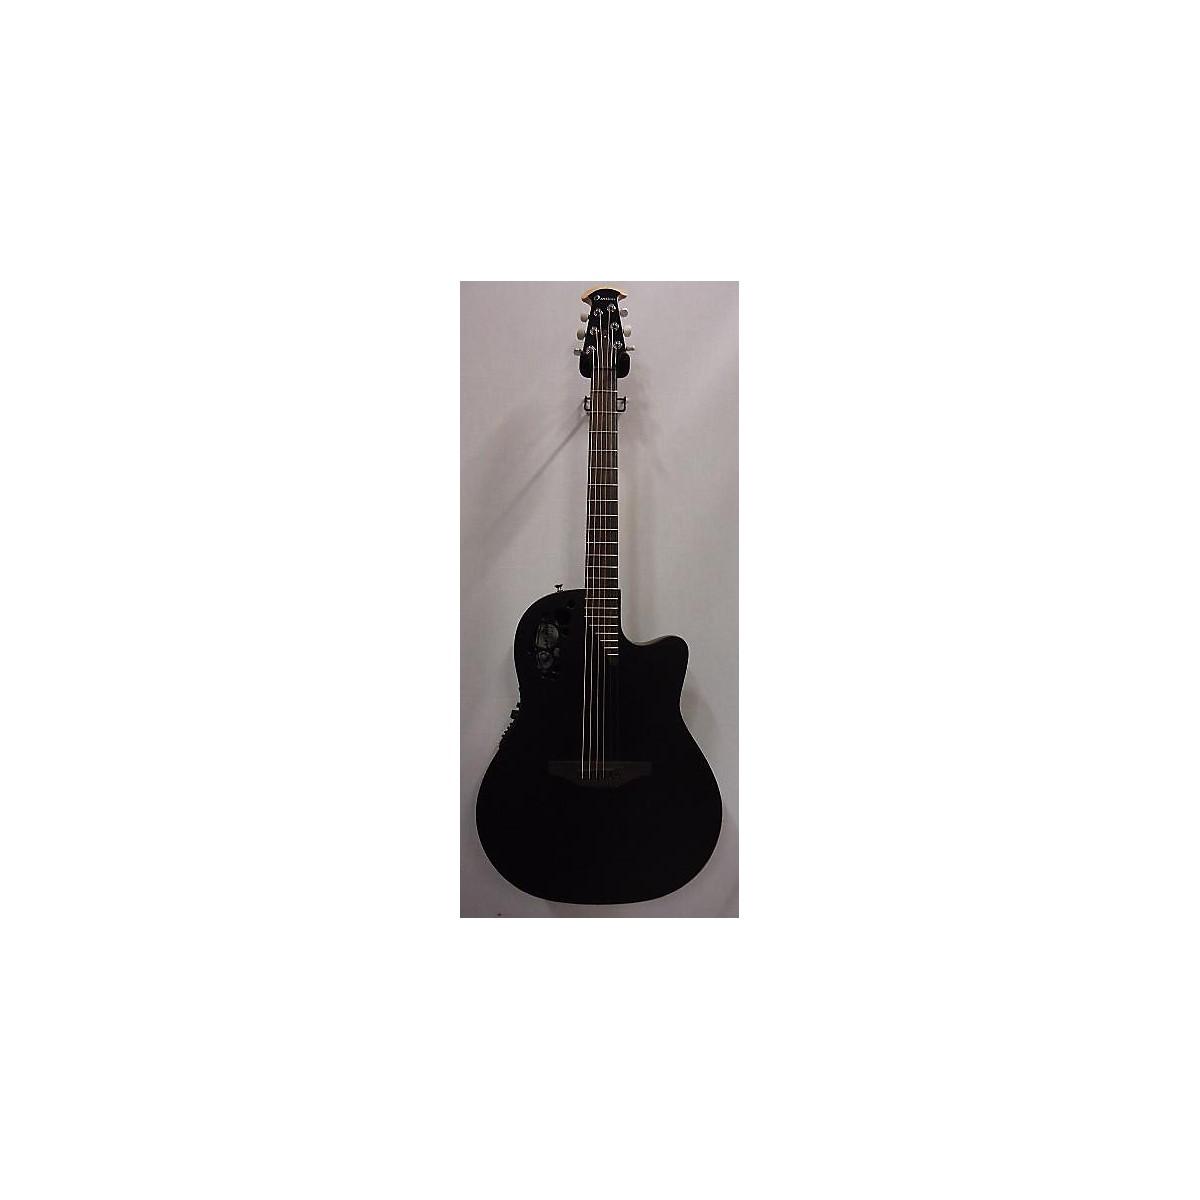 Ovation 1868lxt-5 Acoustic Electric Guitar